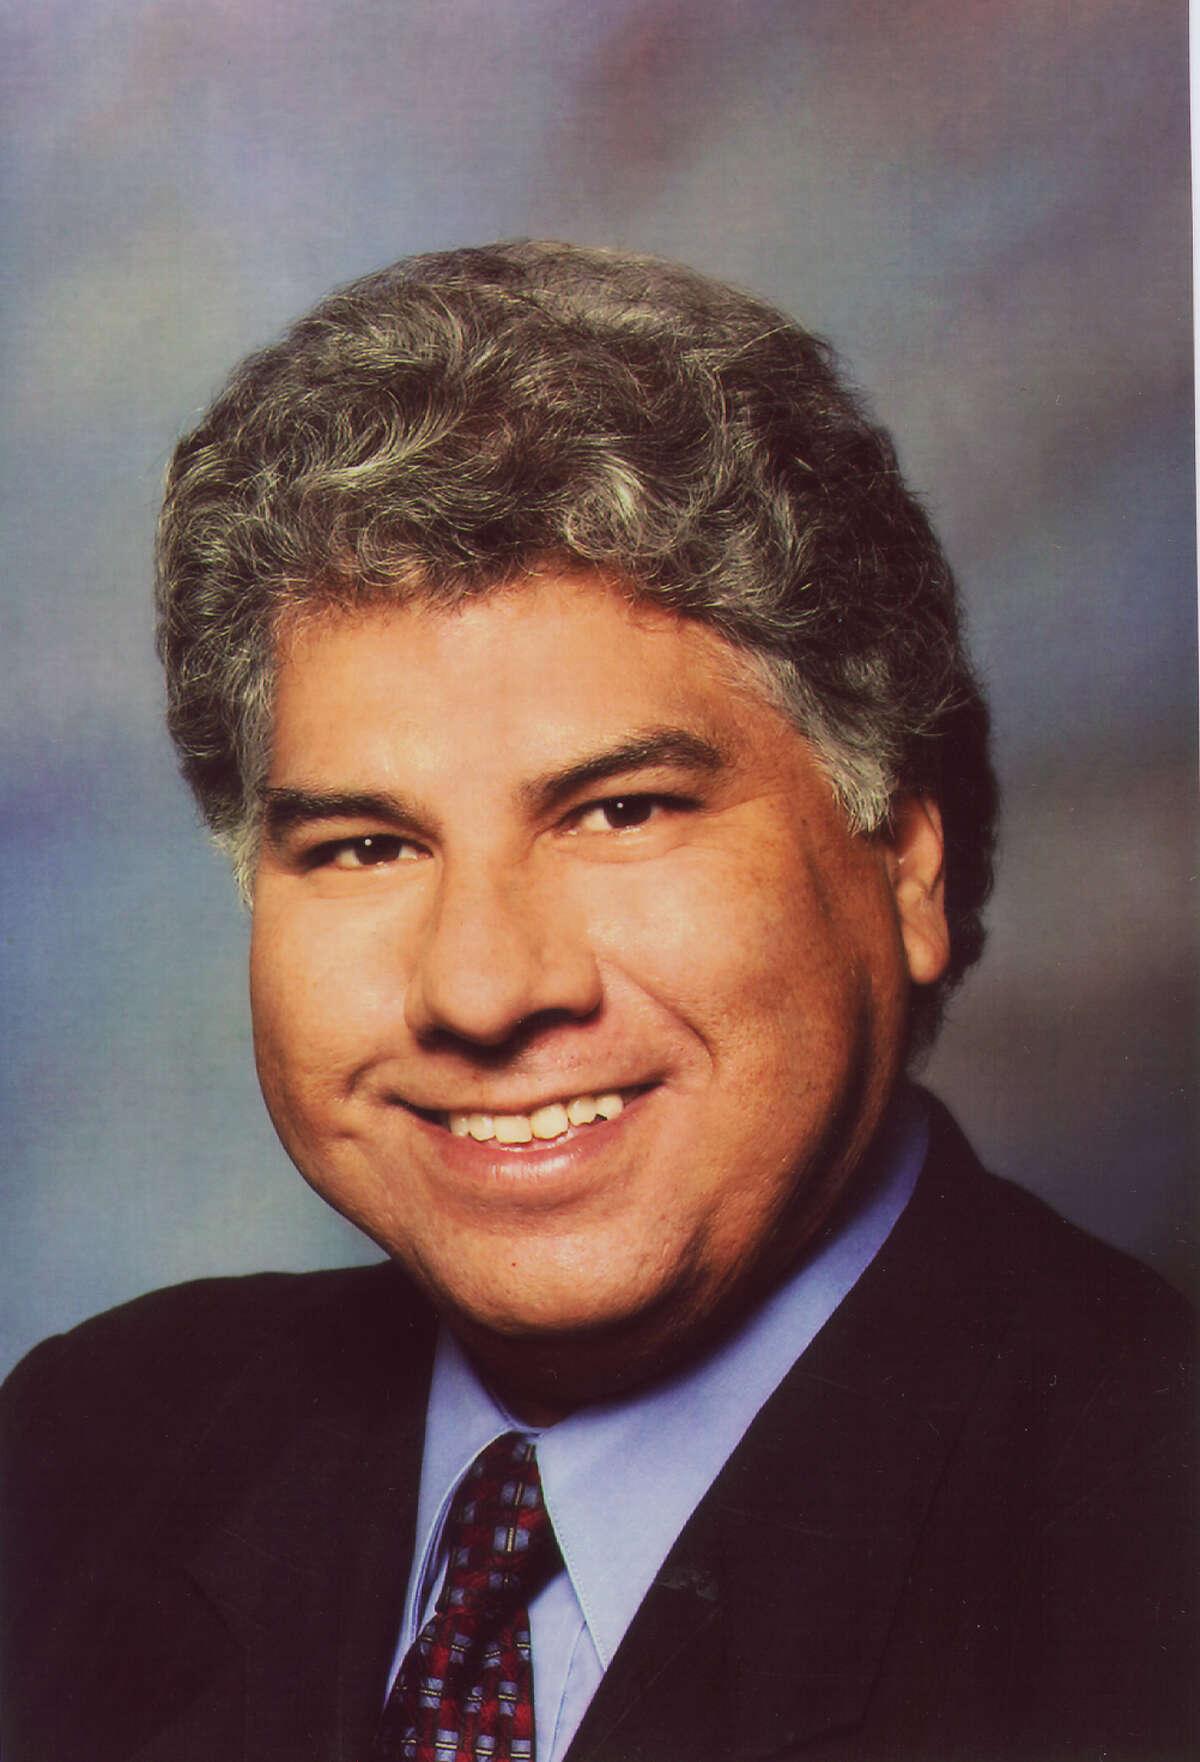 George Gutierrez